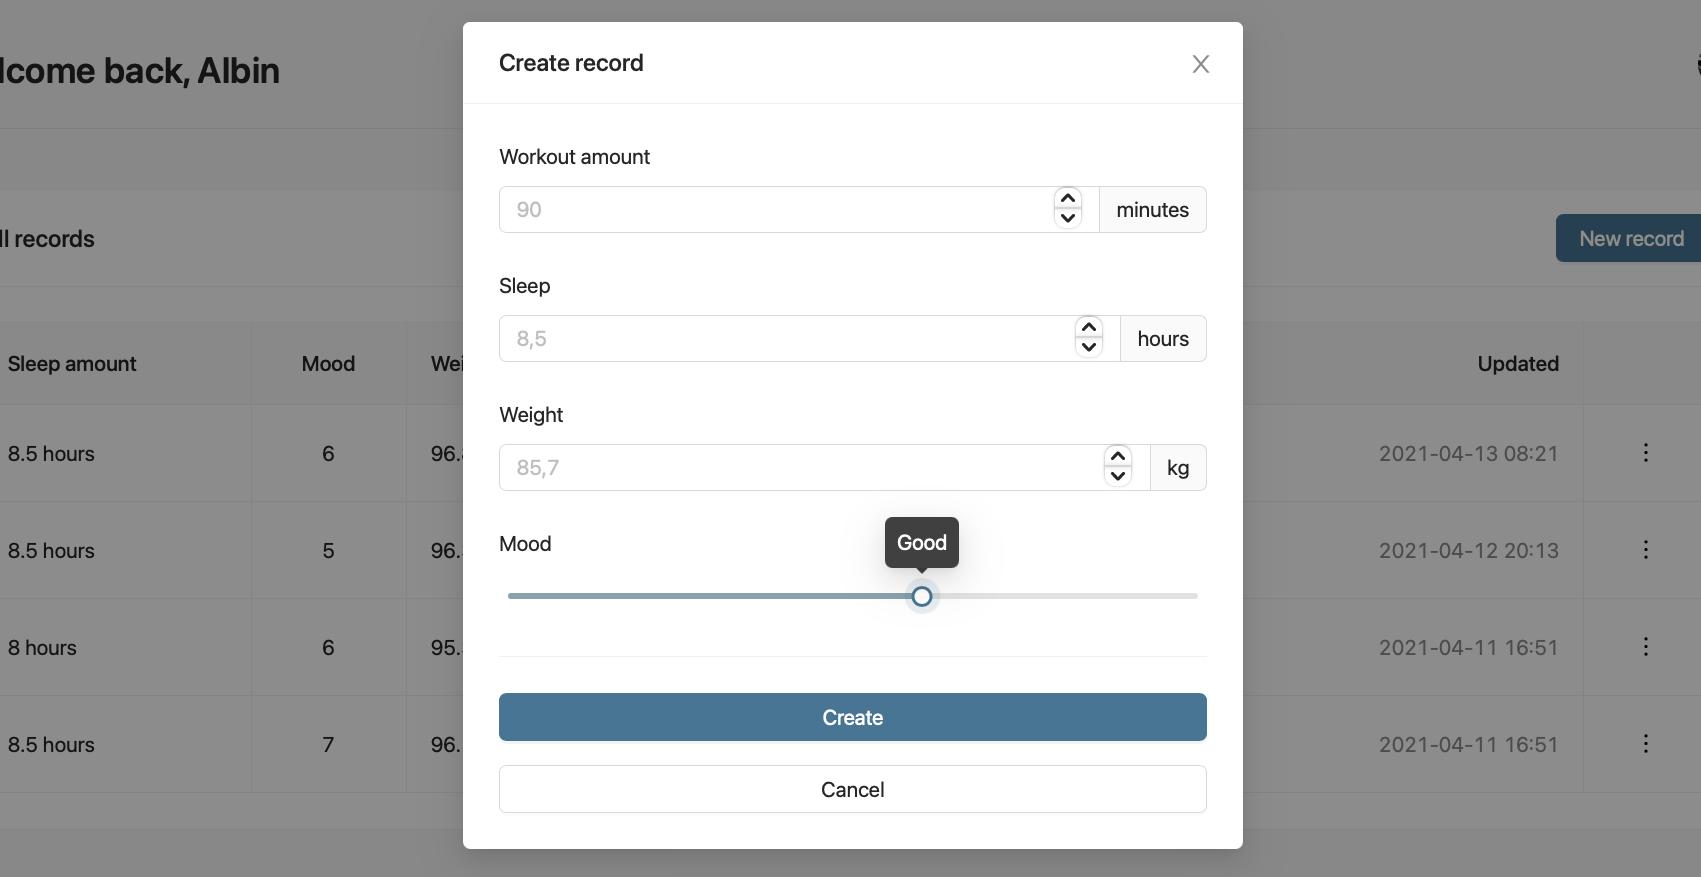 create record modal